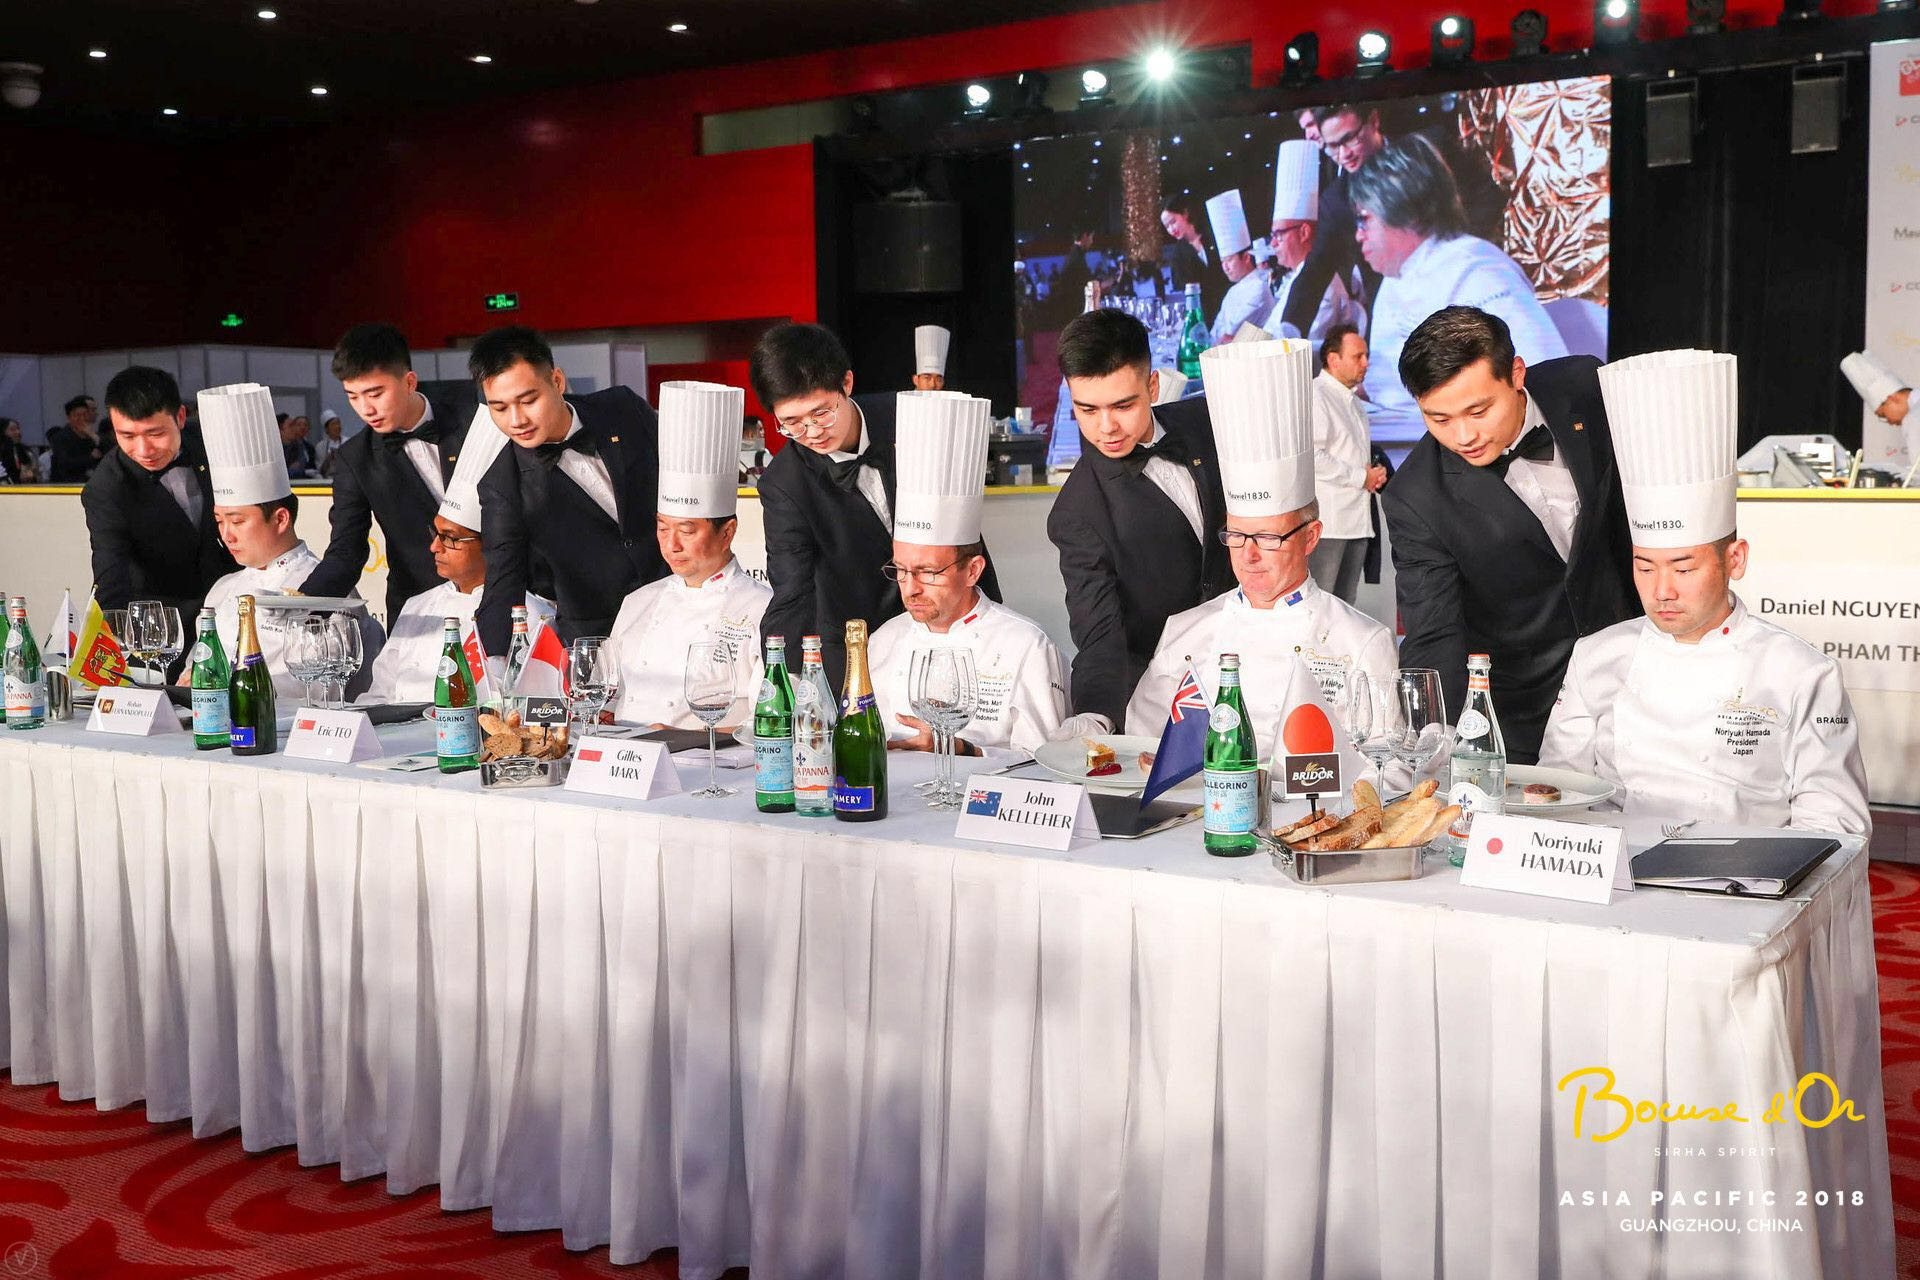 The Podium of 2018 Bocuse d'Or Asia Pacific